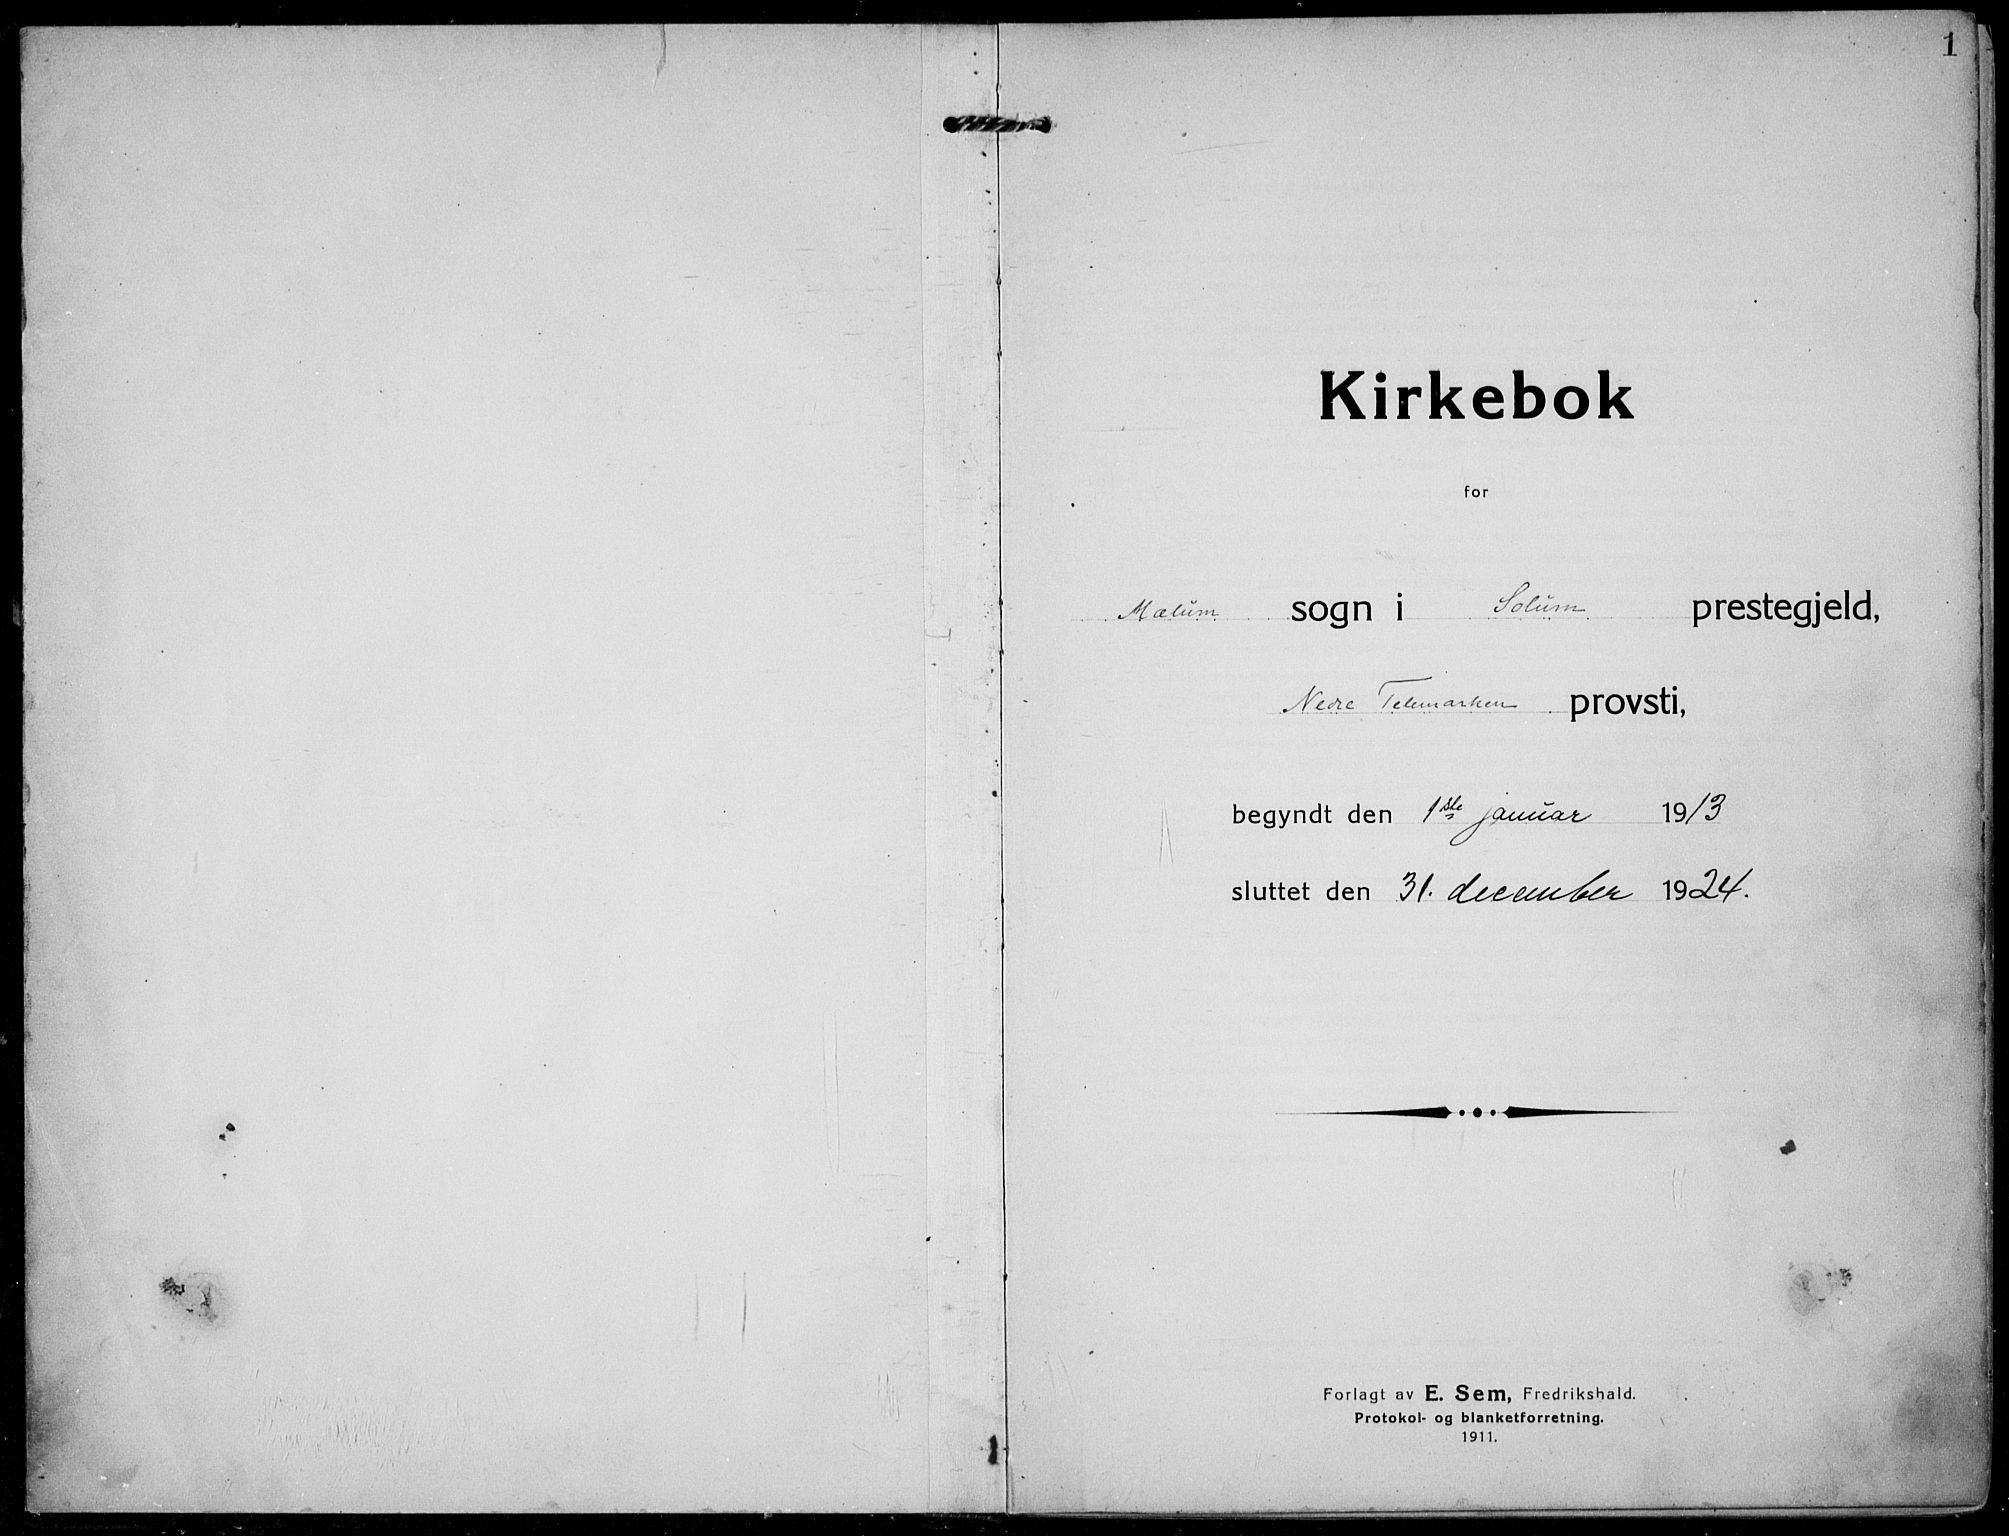 SAKO, Solum kirkebøker, F/Fb/L0004: Ministerialbok nr. II 4, 1913-1924, s. 1